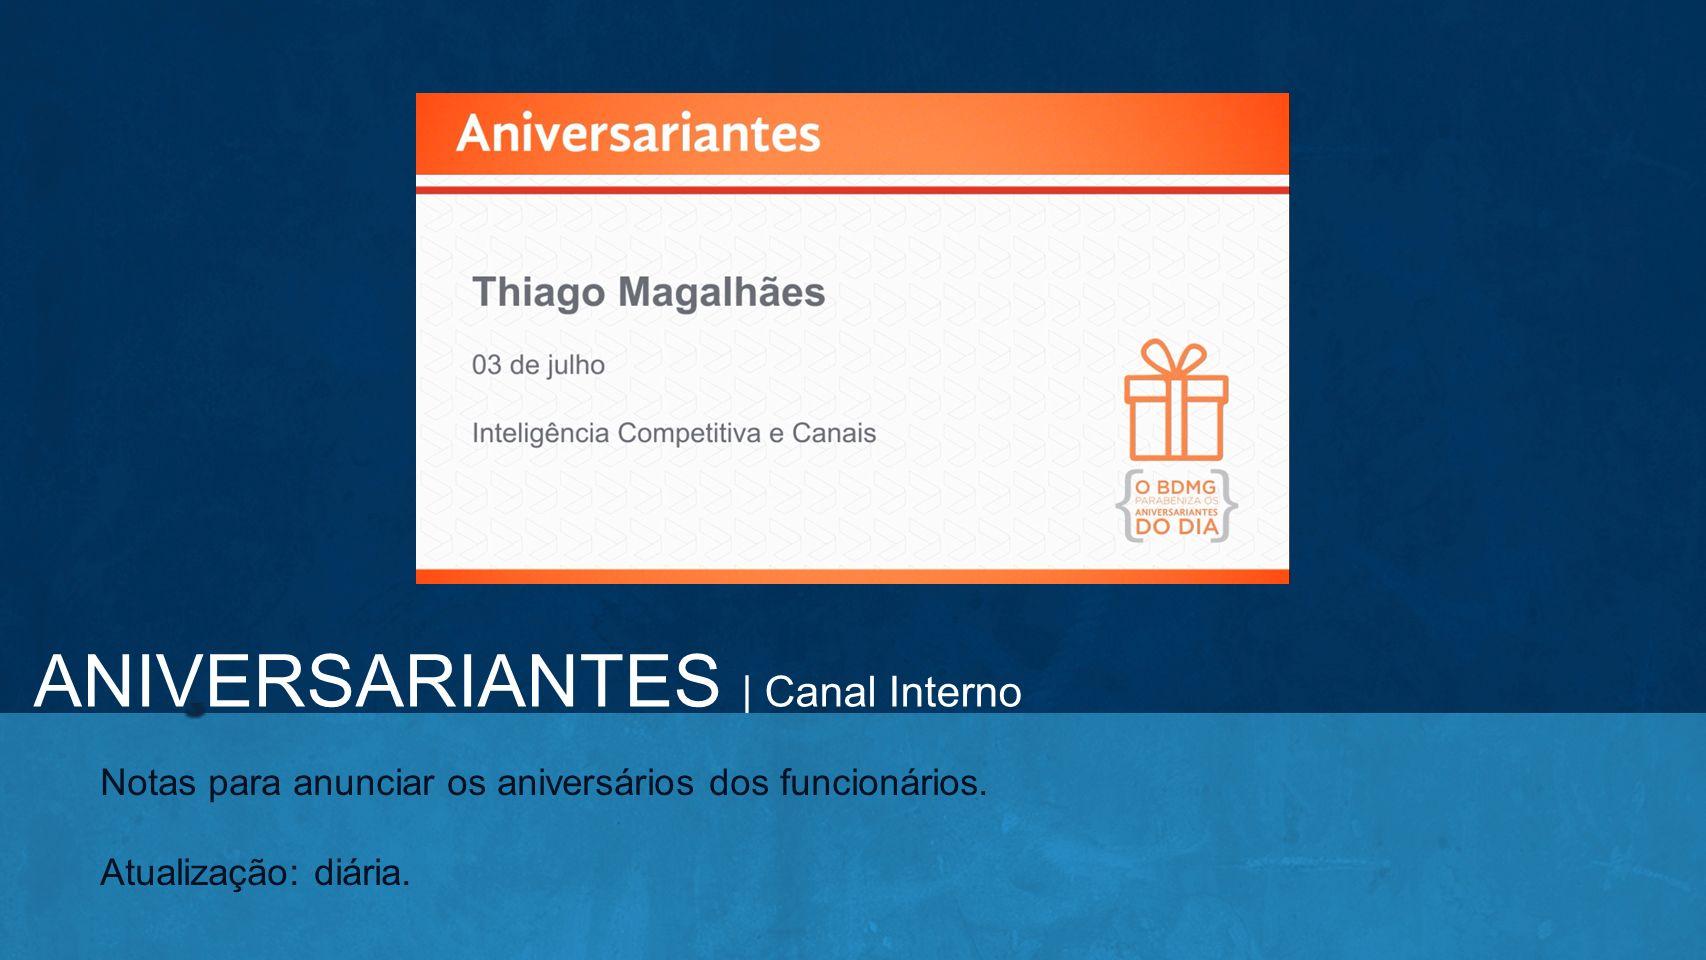 ANIVERSARIANTES | Canal Interno